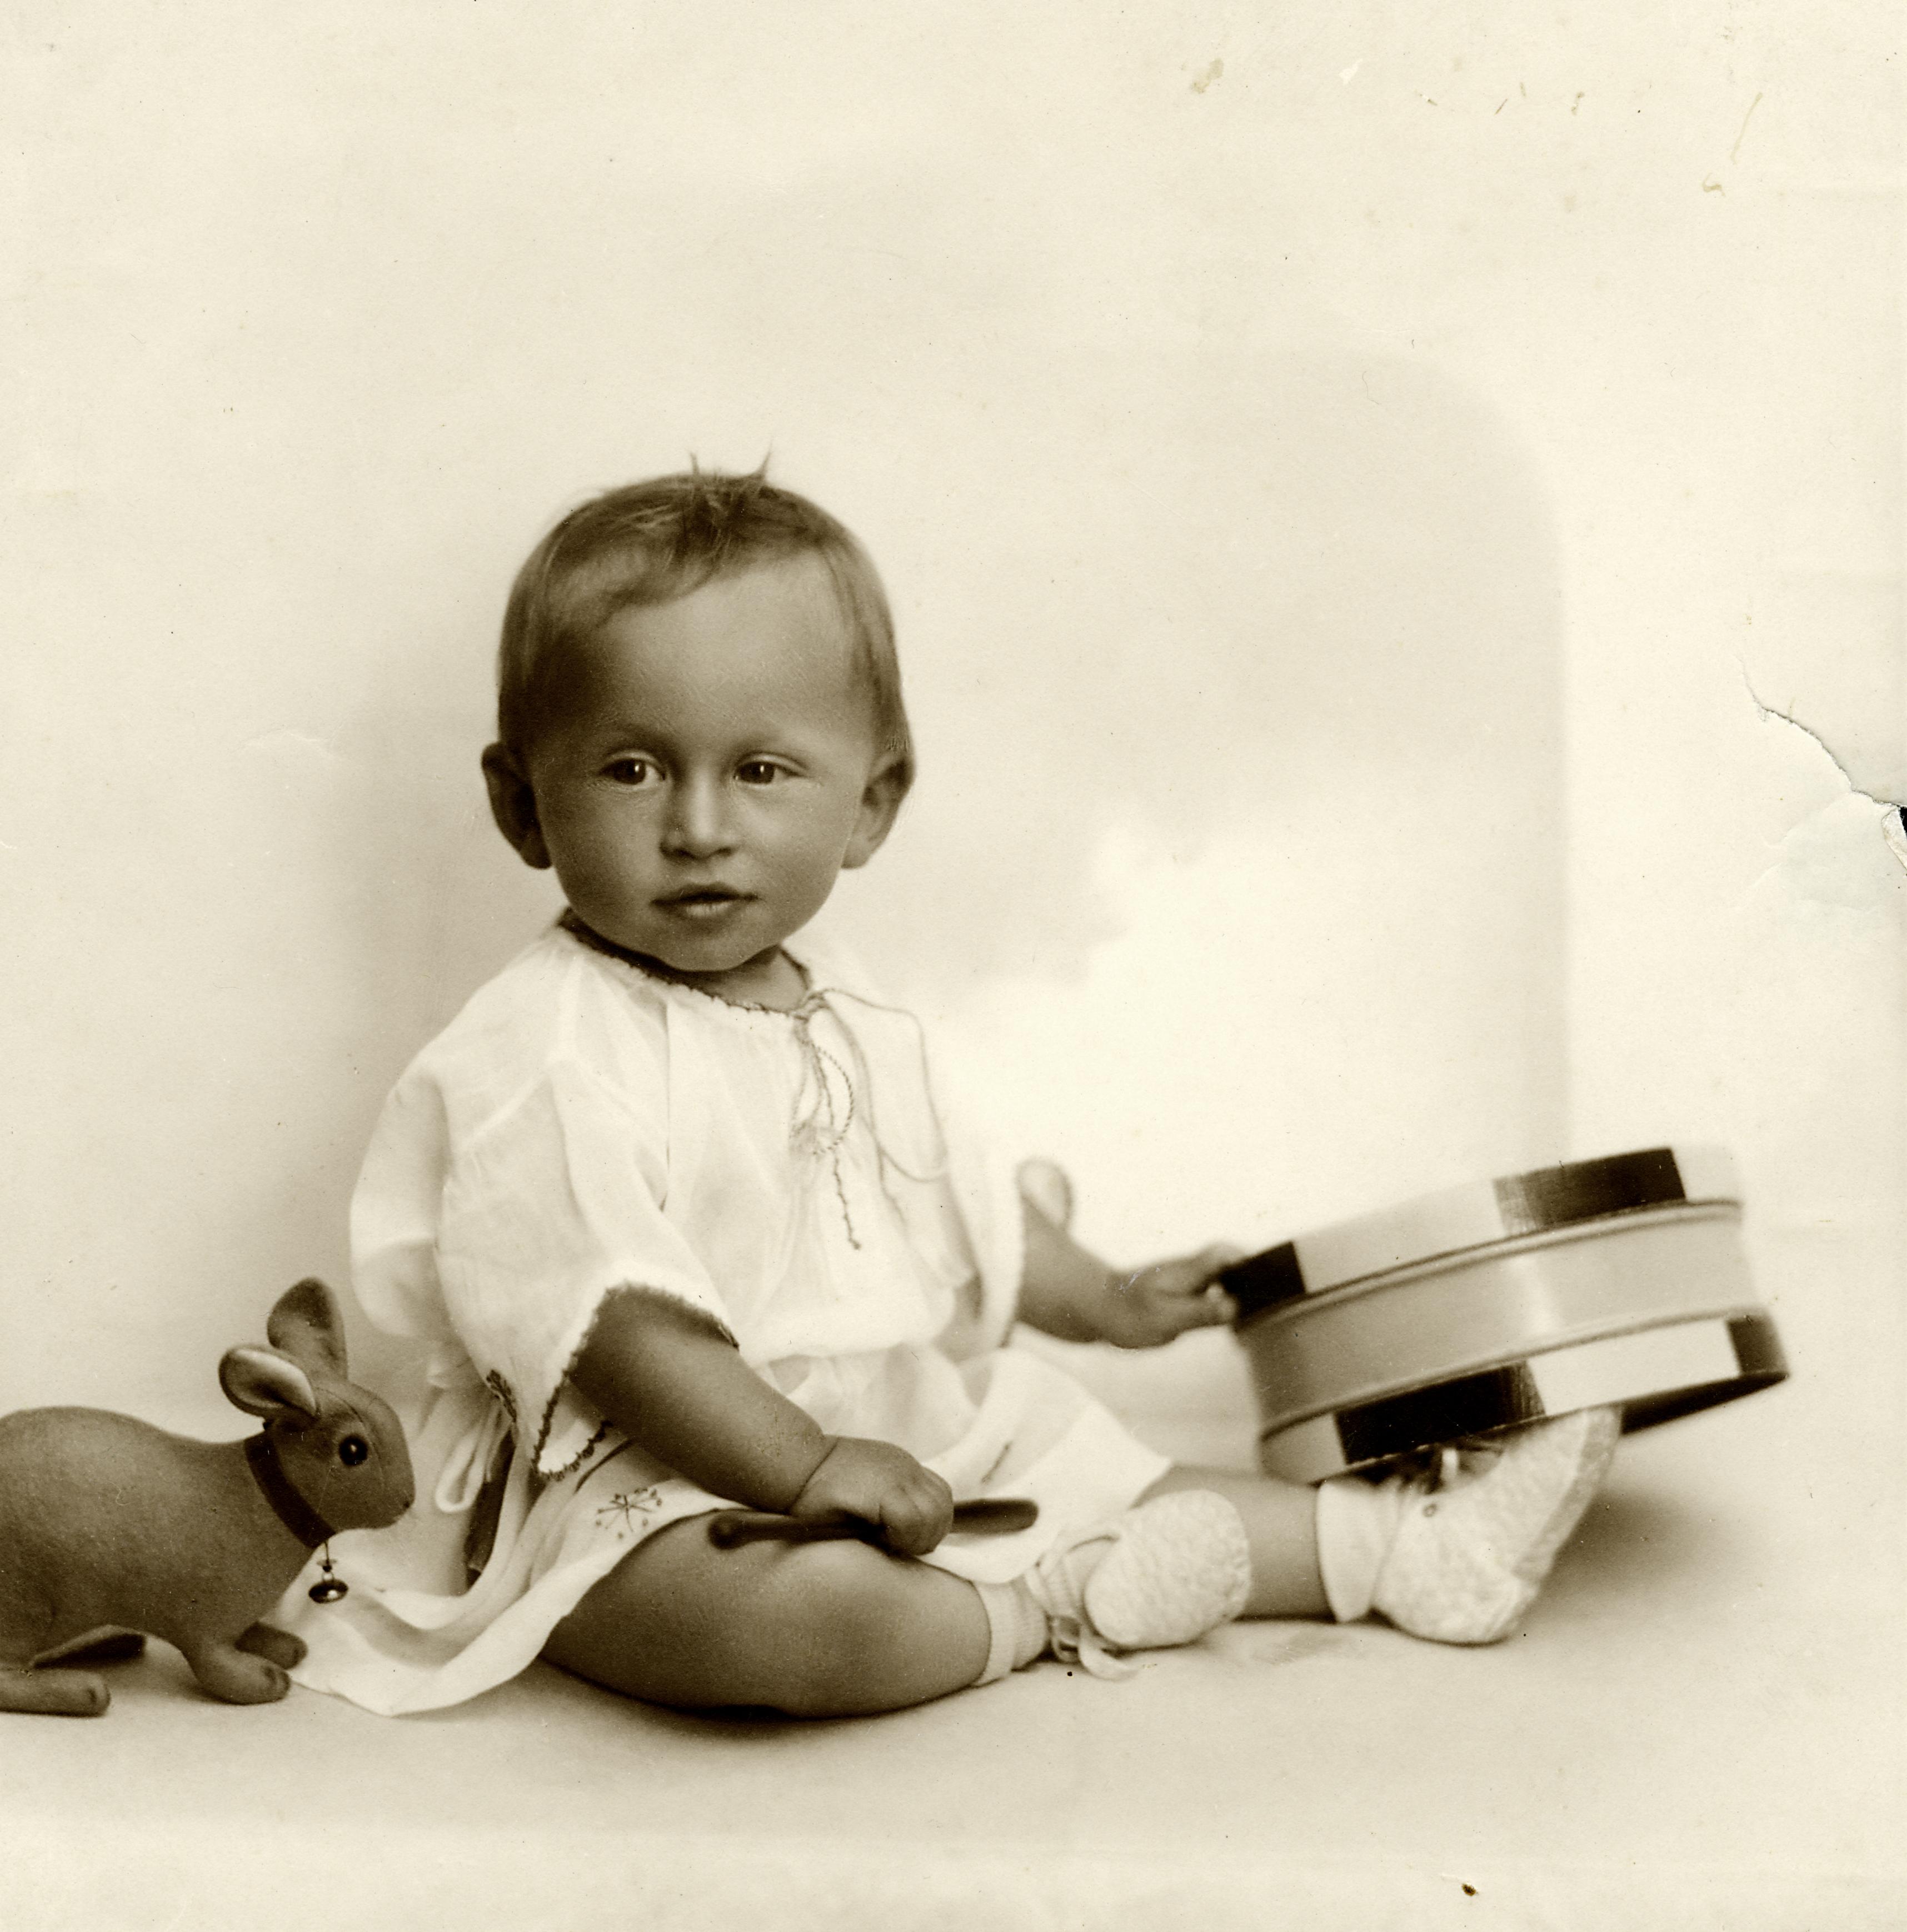 Robert Landesmann als Baby